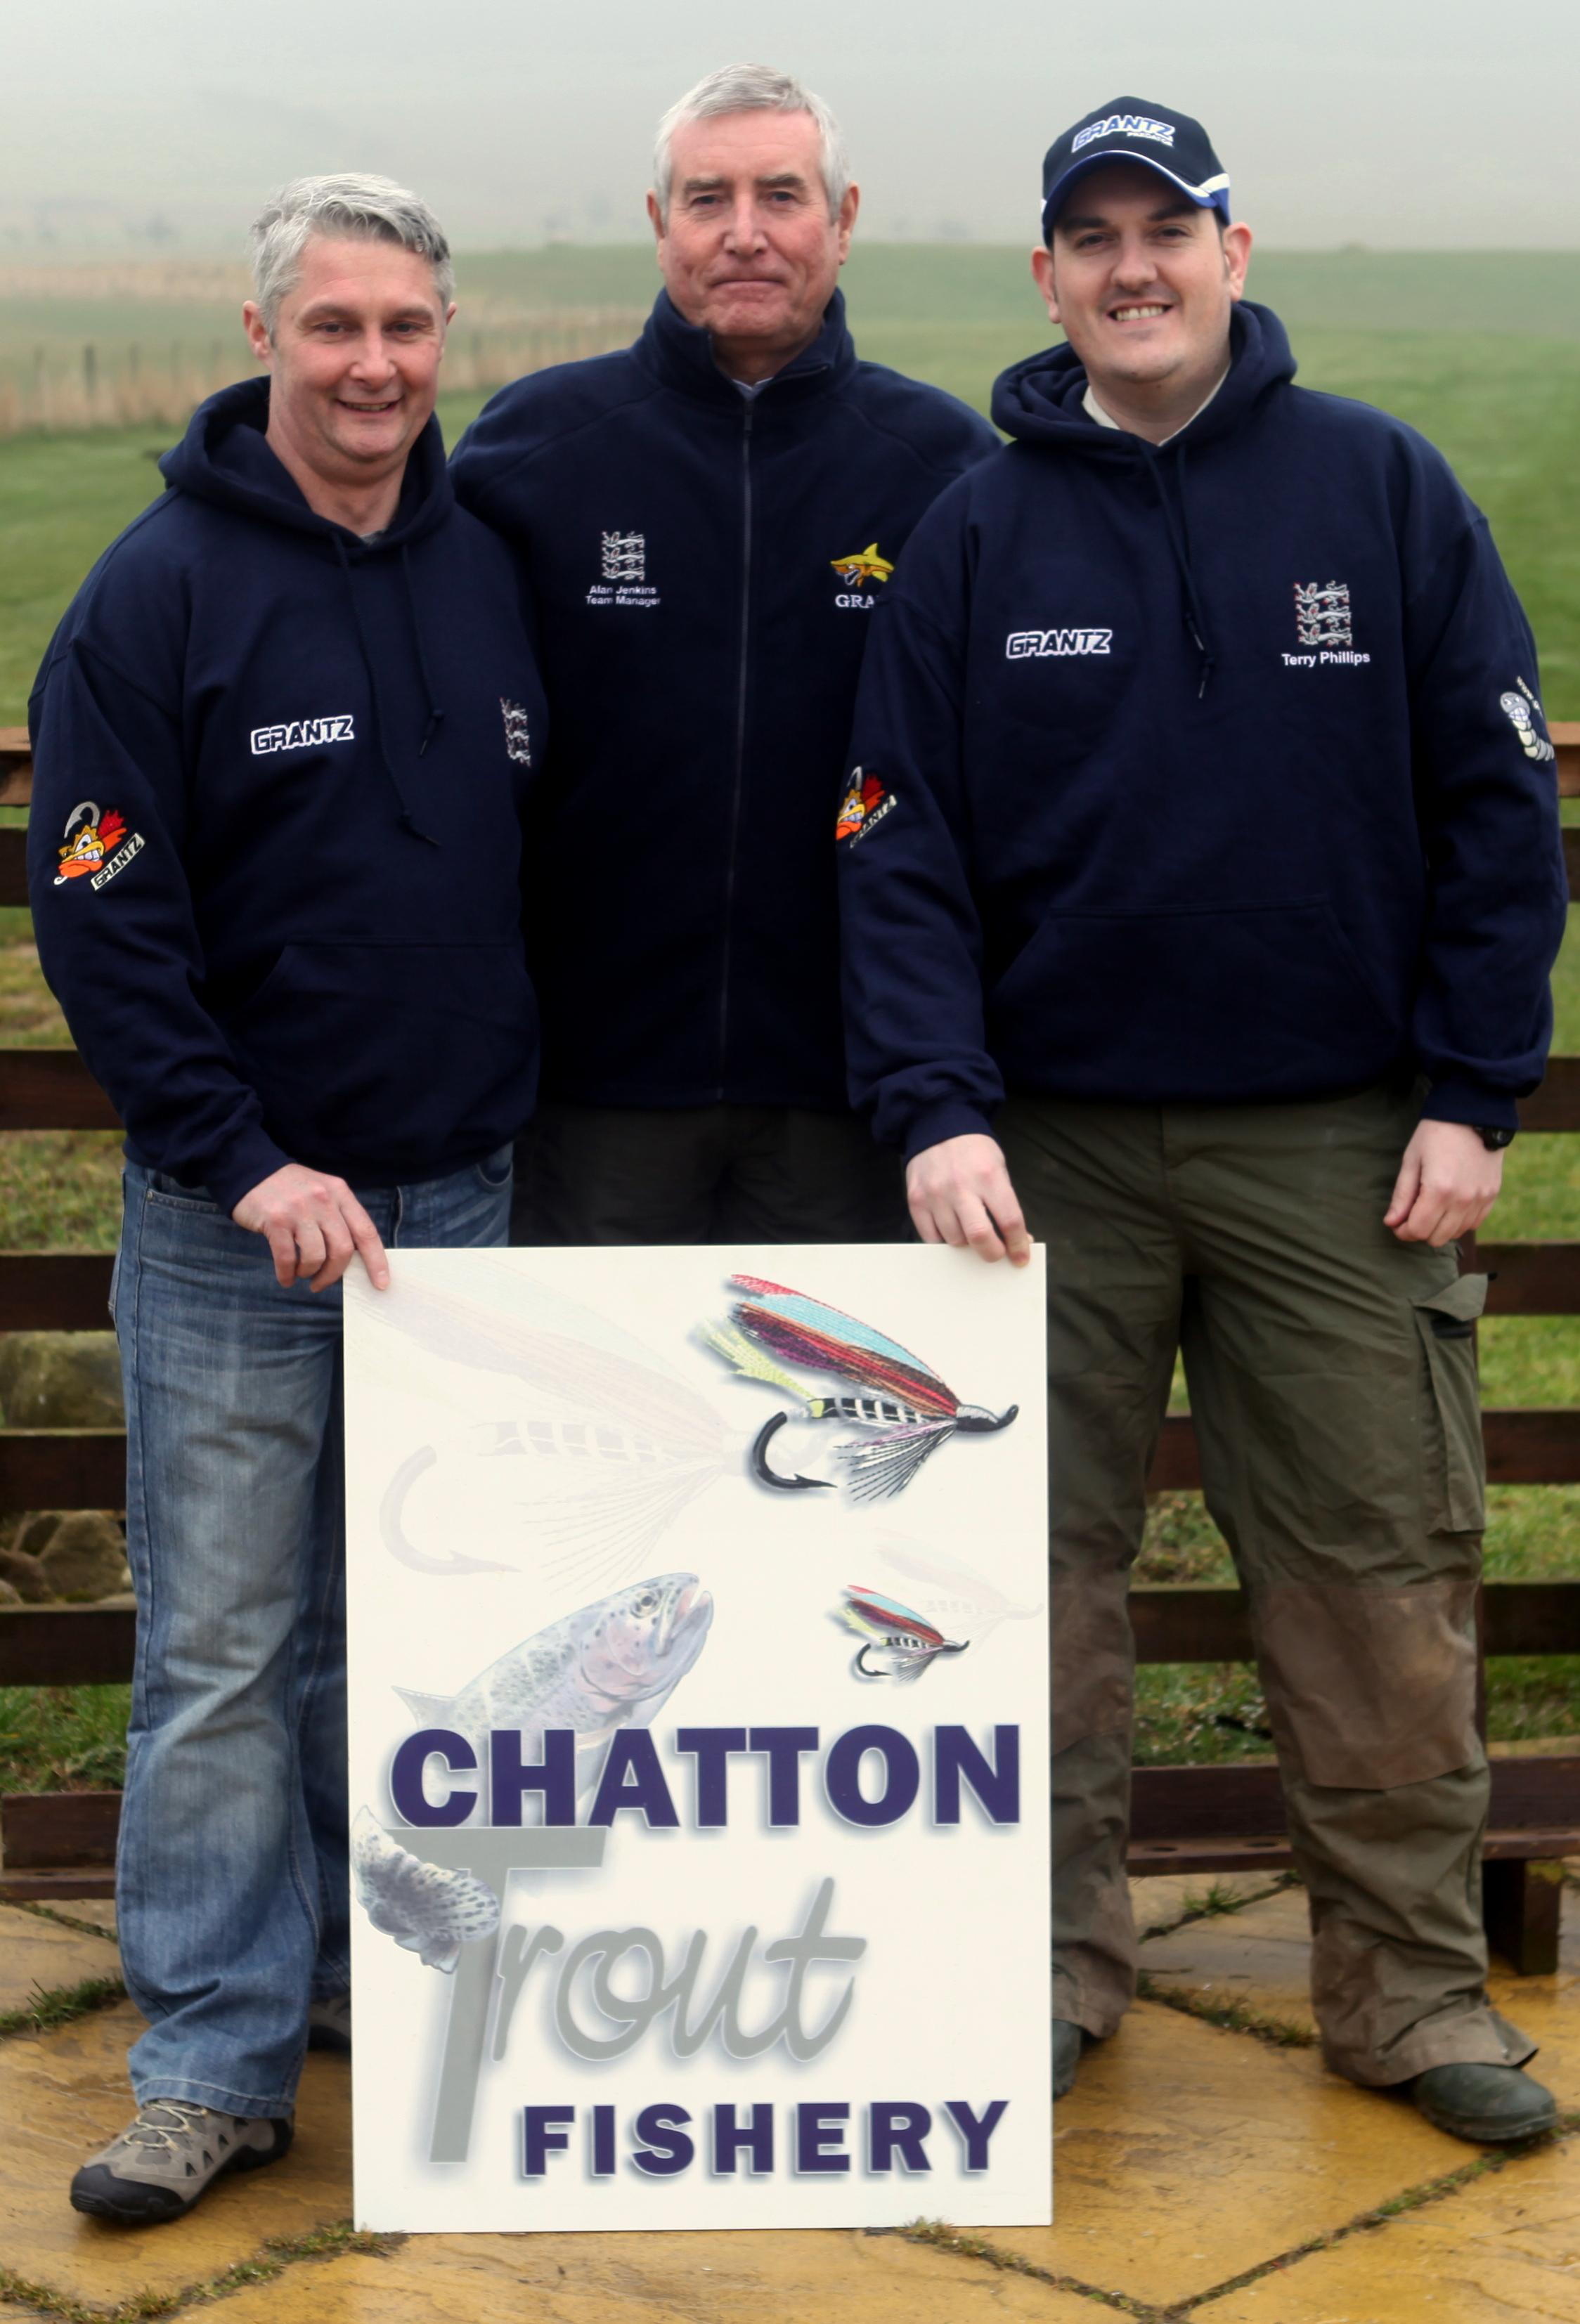 Bank angling trust team england fly fishing for Fishing sponsor shirts